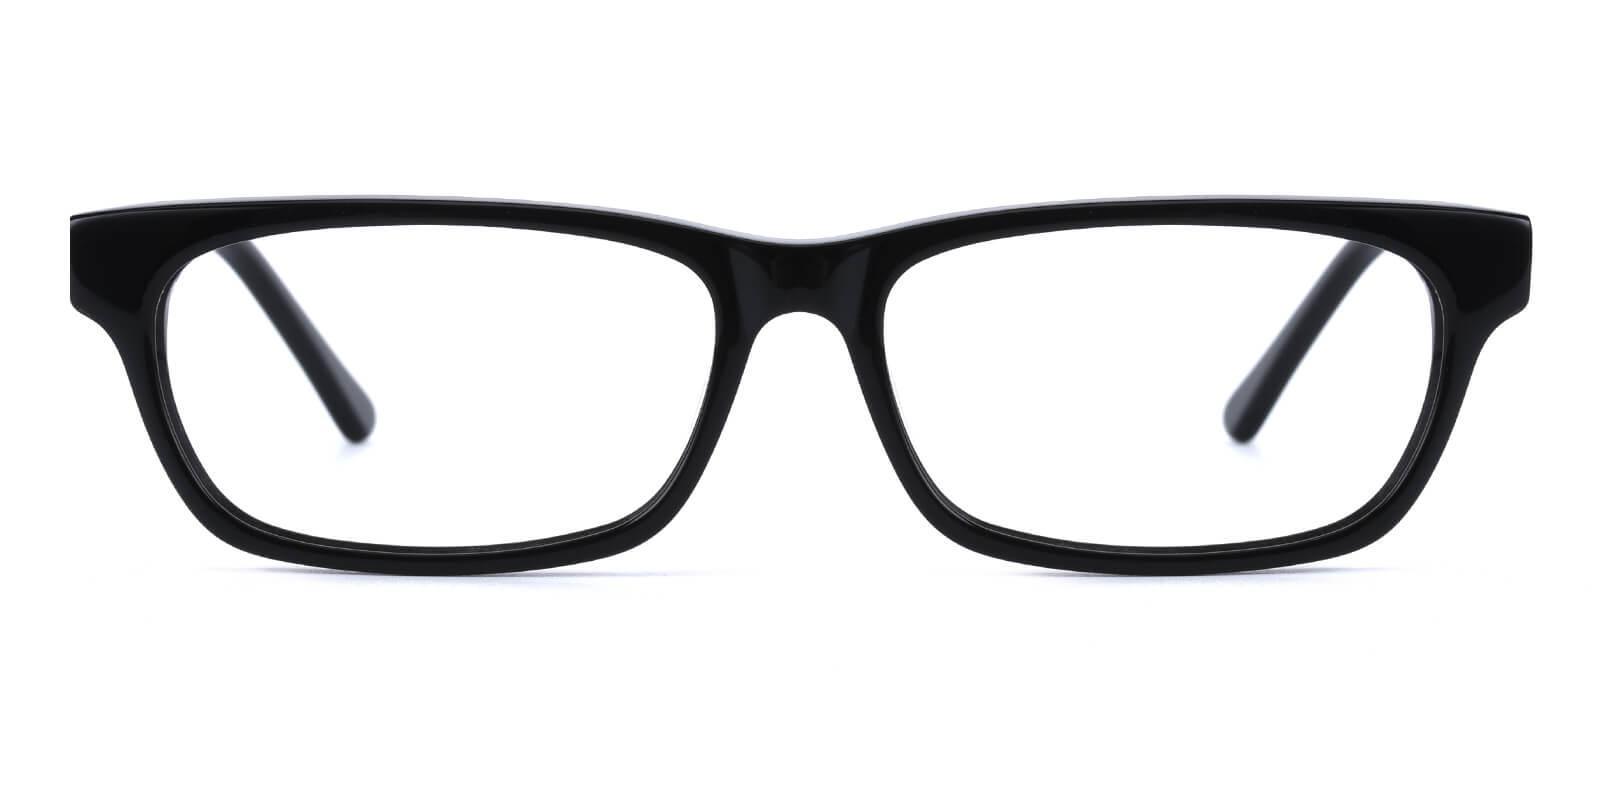 Mia-Black-Rectangle-Acetate-Eyeglasses-additional2